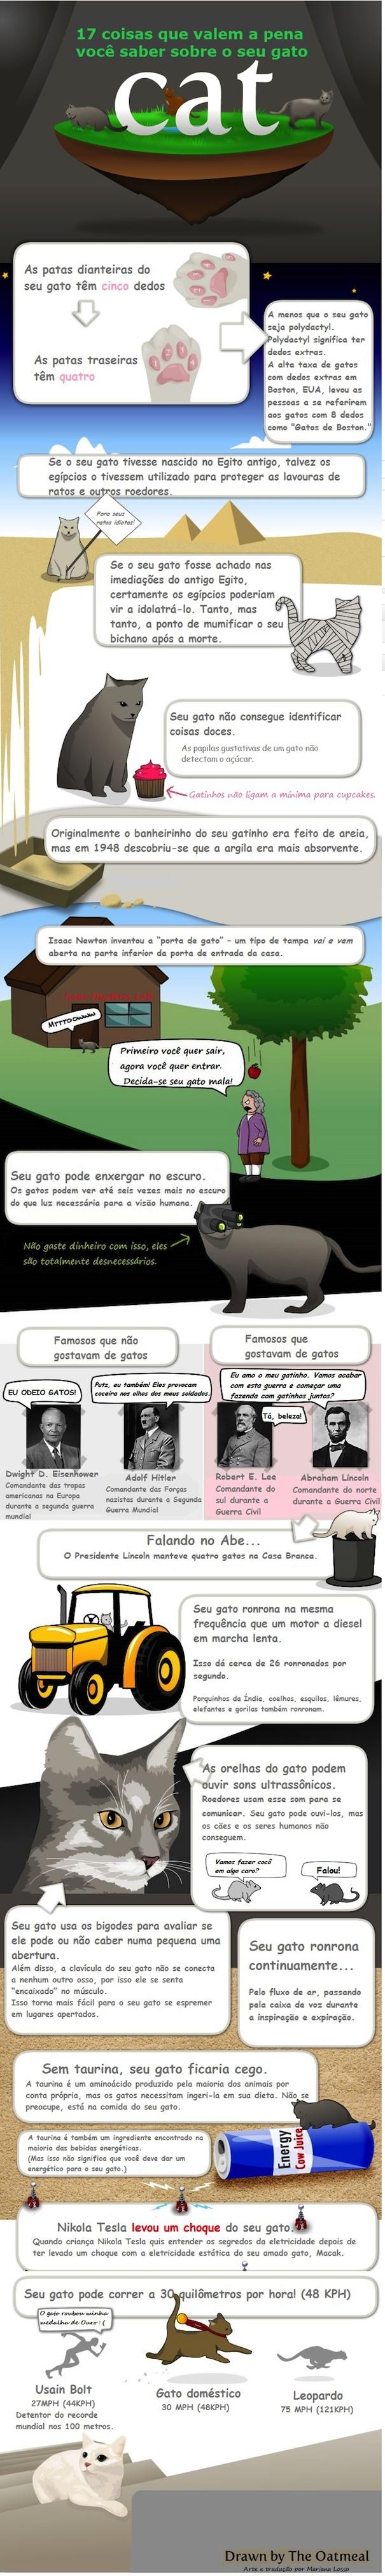 17 Curiosidades Sobre os Gatos